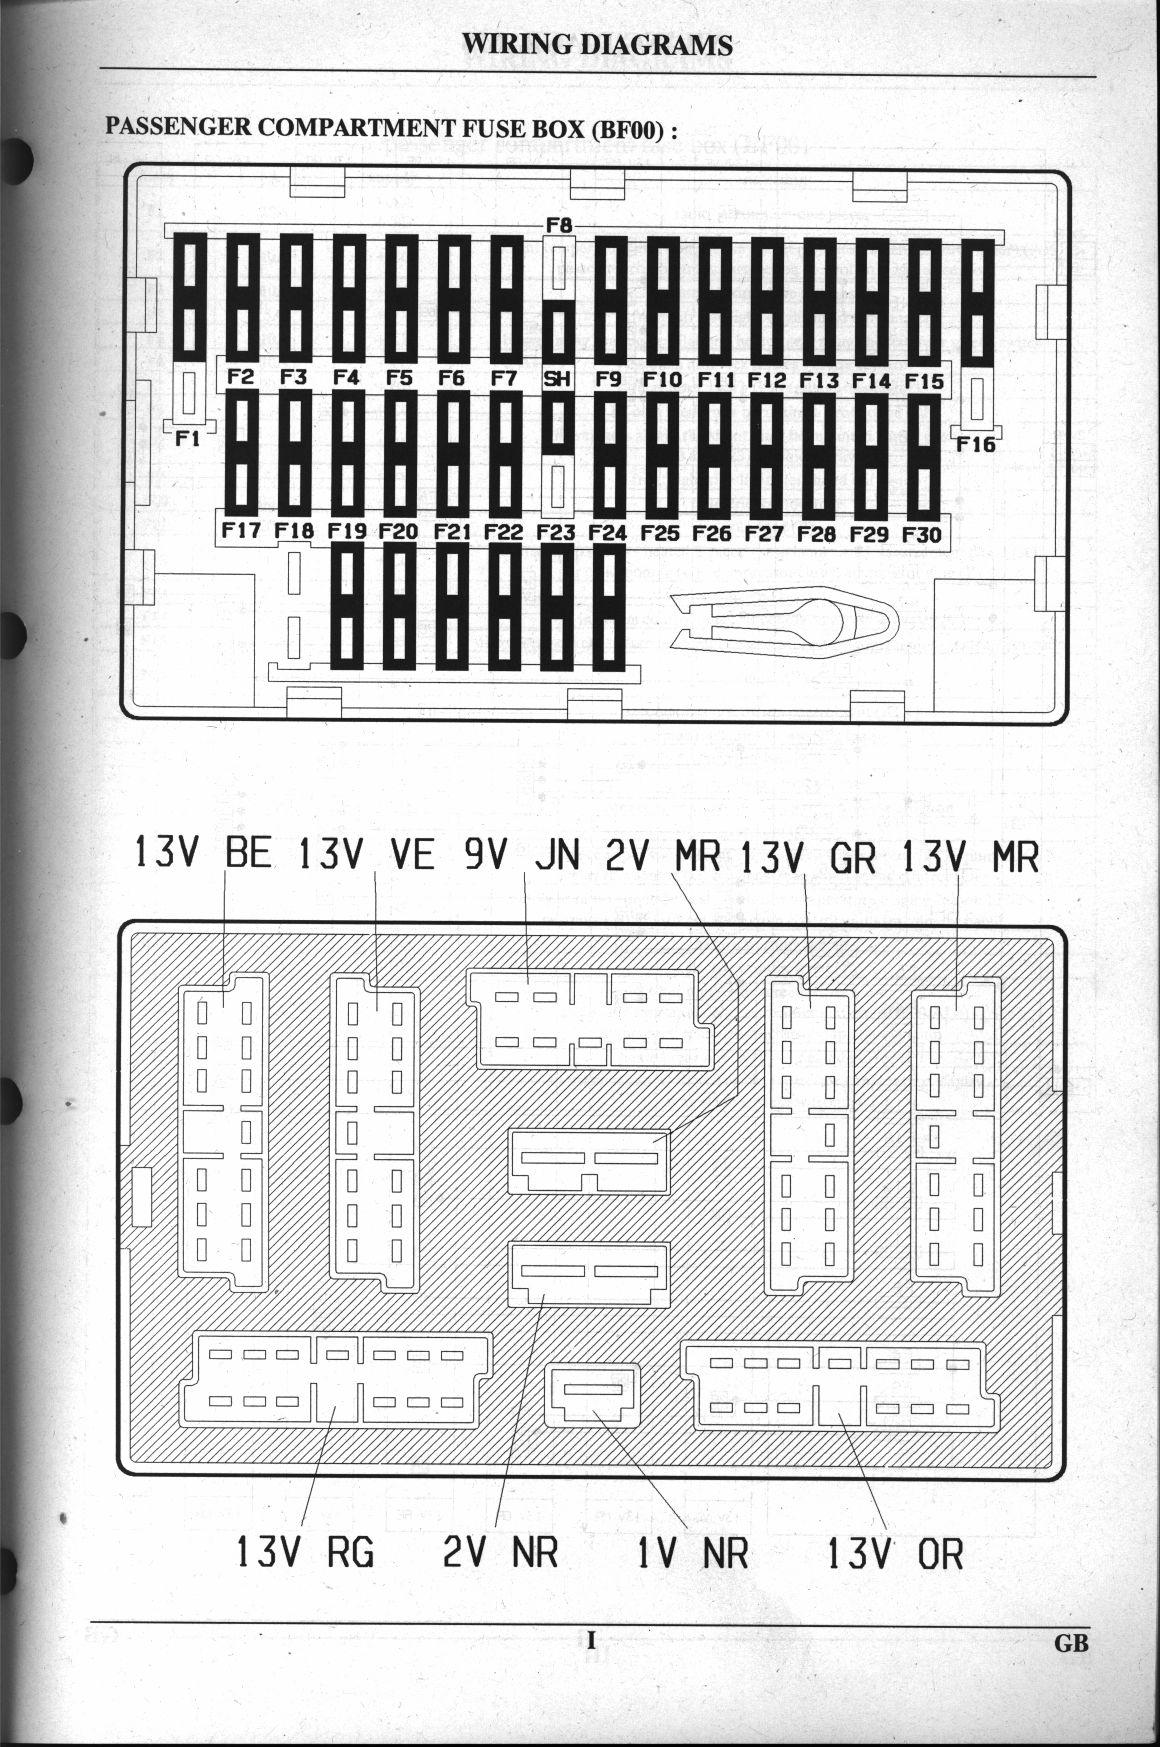 Citroen Synergie Fuse Box - Wiring Diagram Options crop-return -  crop-return.nerdnest.it | Citroen Synergie Wiring Diagram |  | crop-return.nerdnest.it